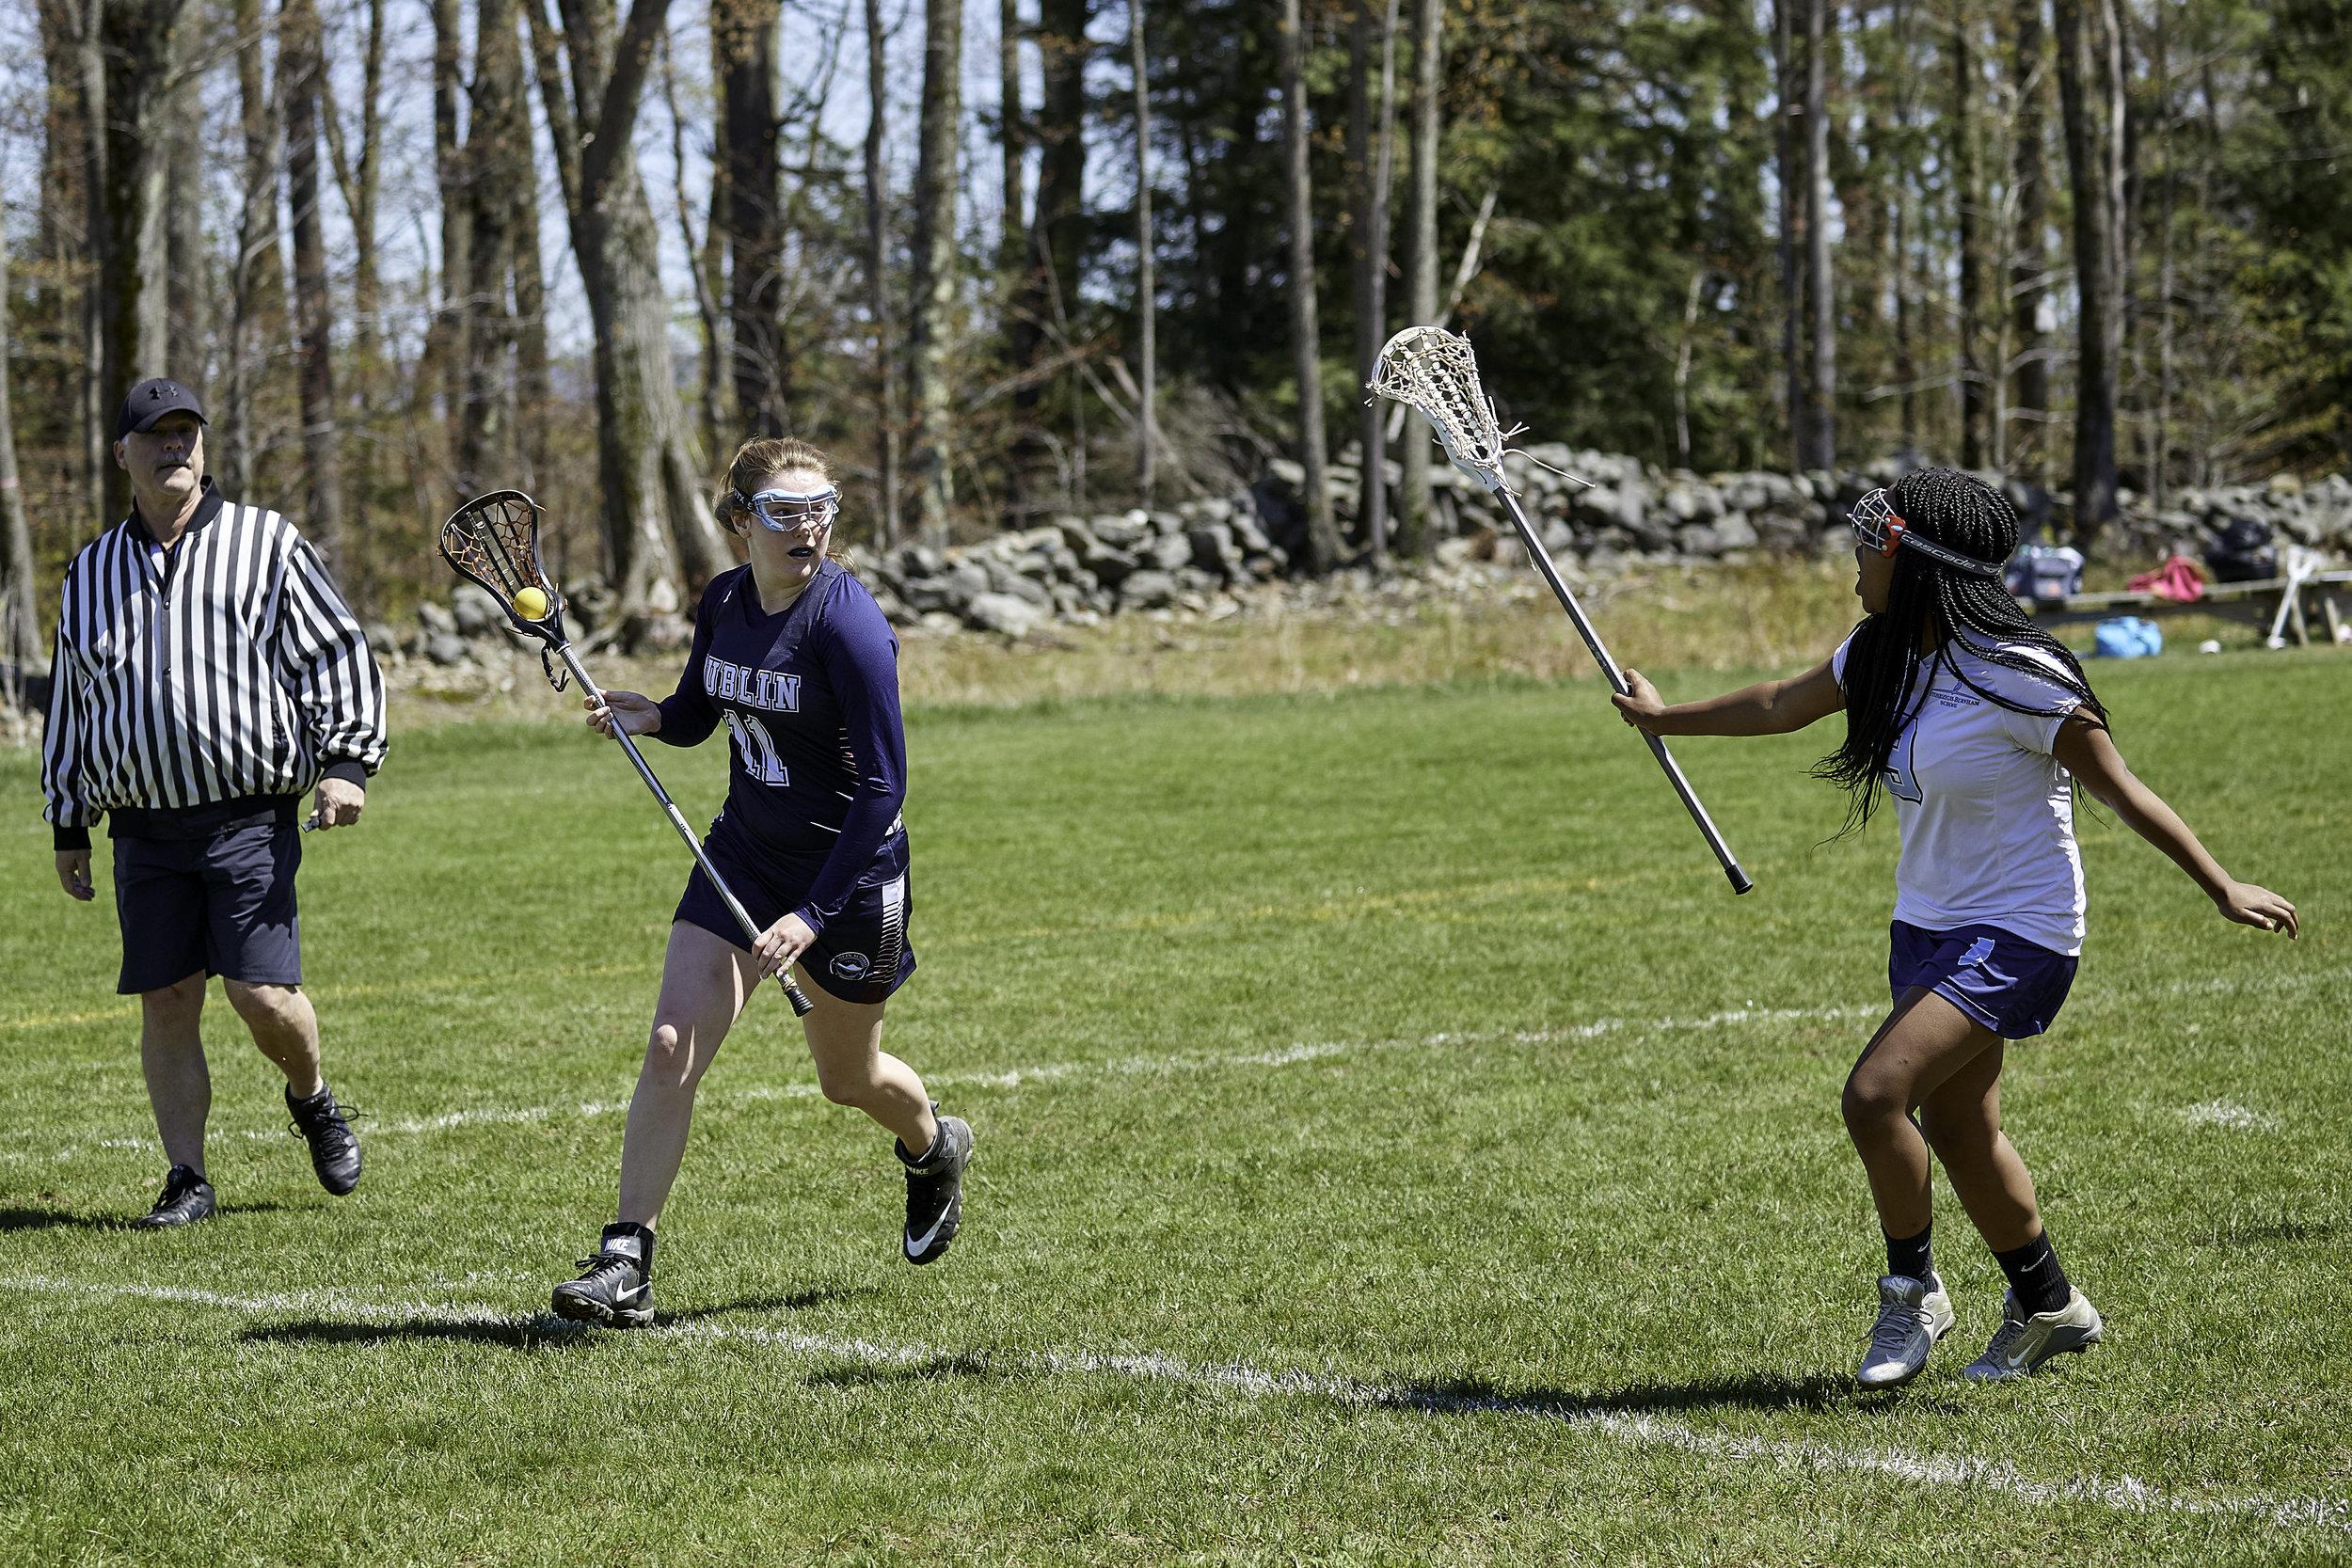 Girls Lacrosse vs. Stoneleigh Burnham School - May 11, 2019 - May 10, 2019193206.jpg